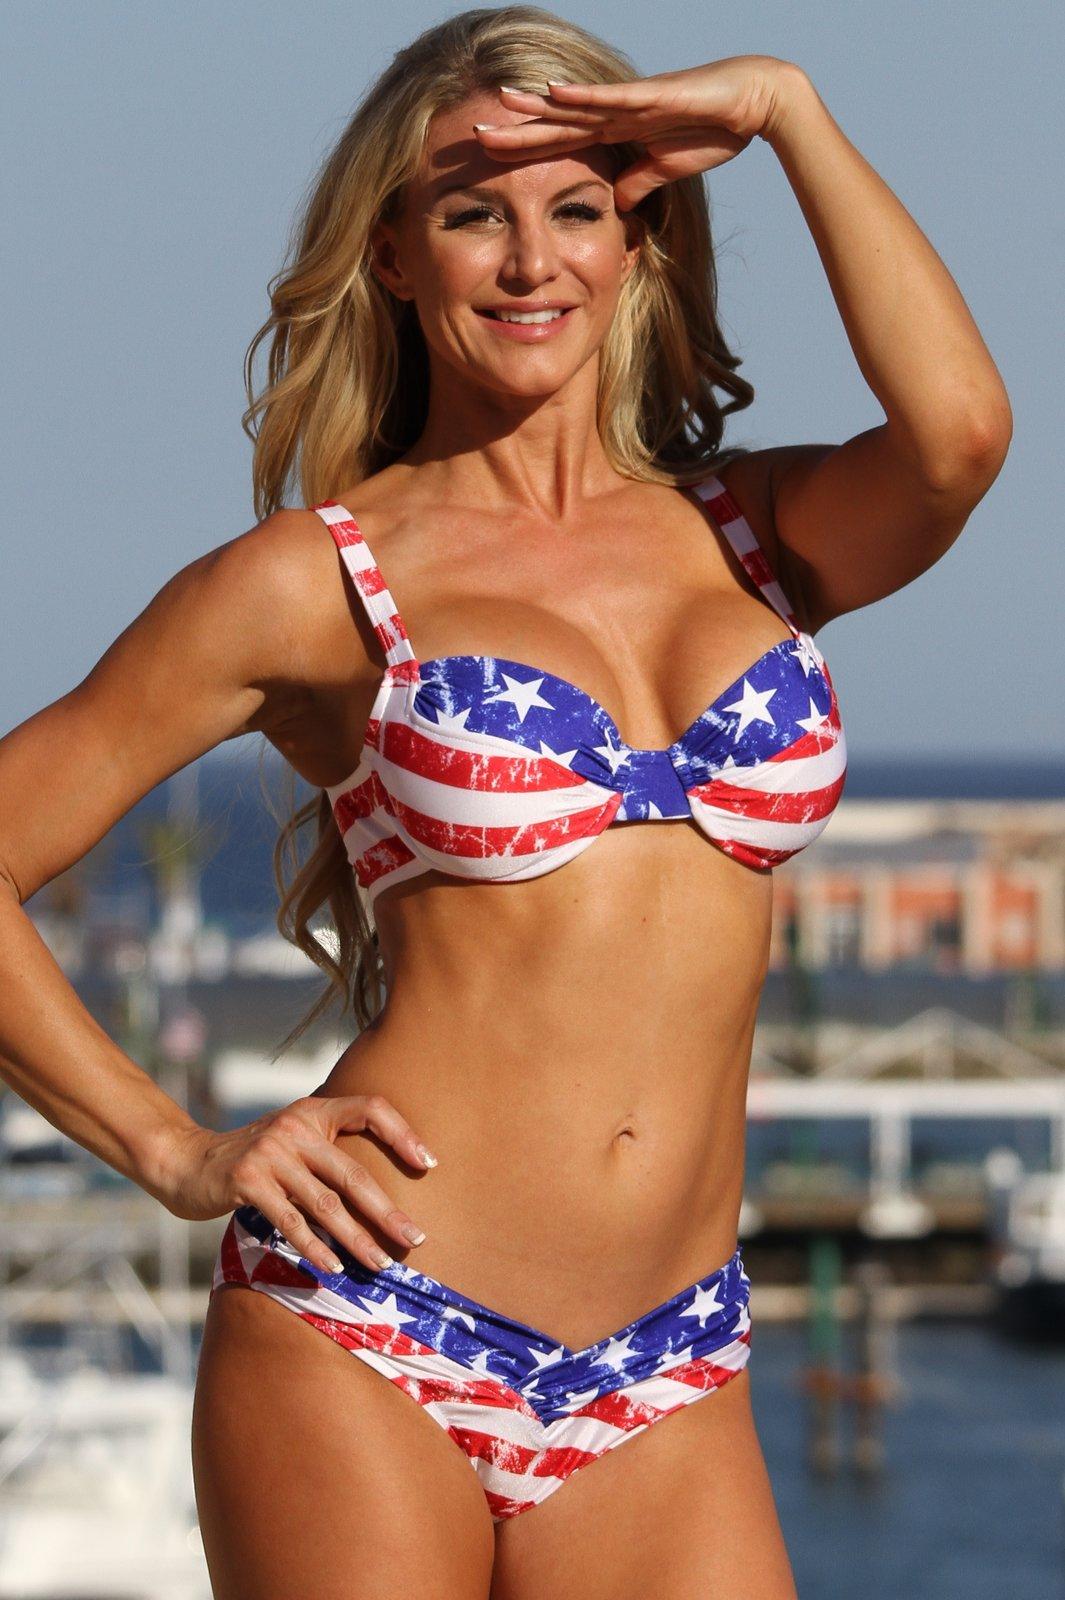 American Underwire Vintage Stars and Stripes Bikini